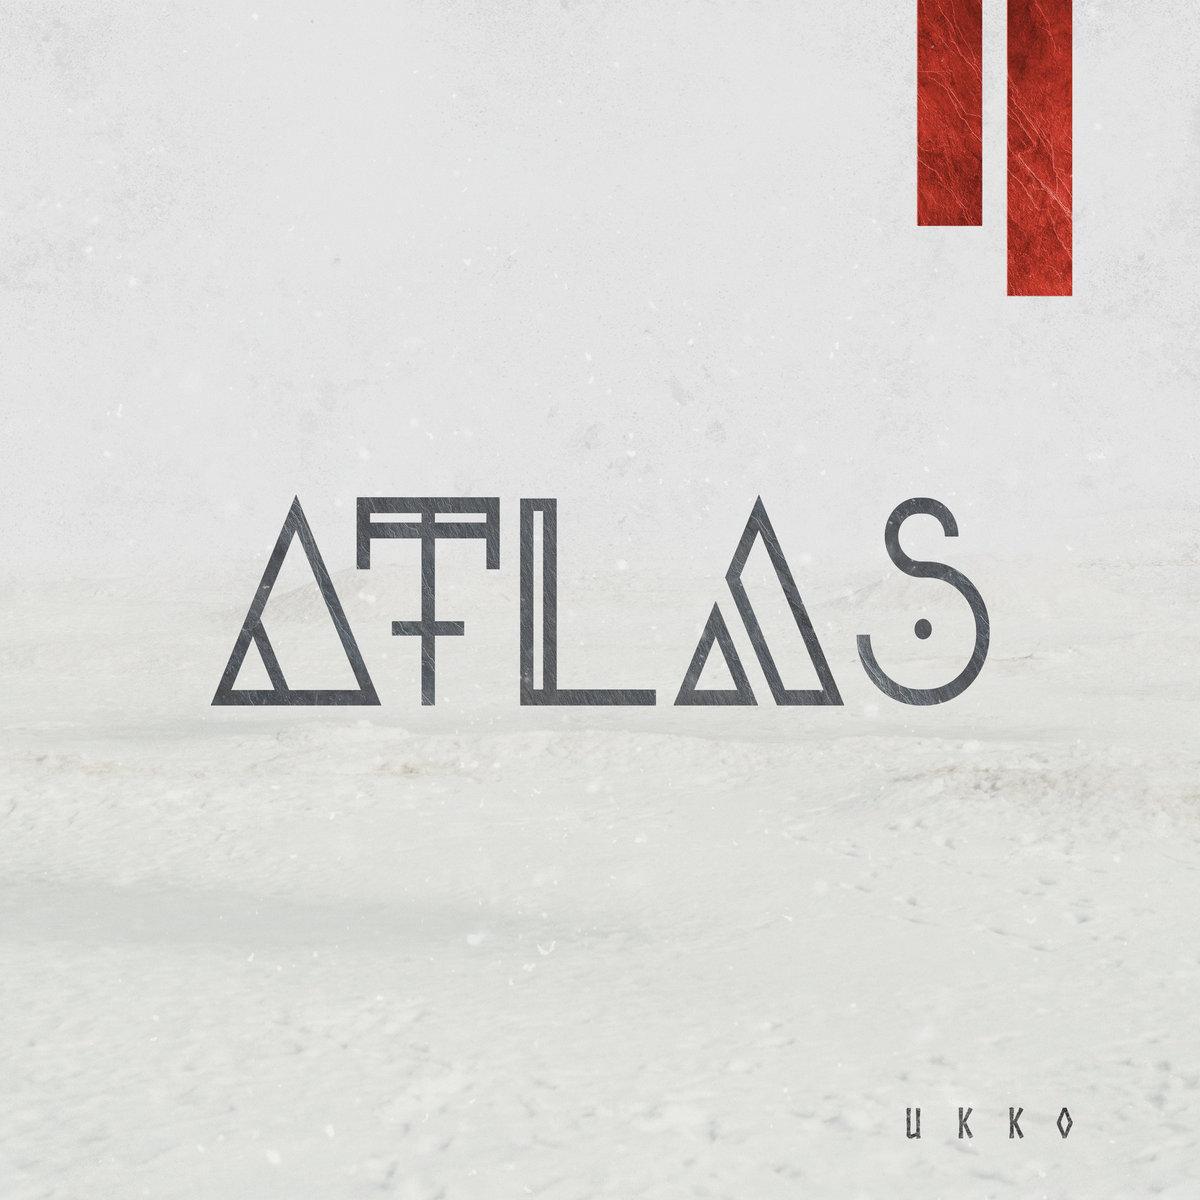 Atlas Ukko